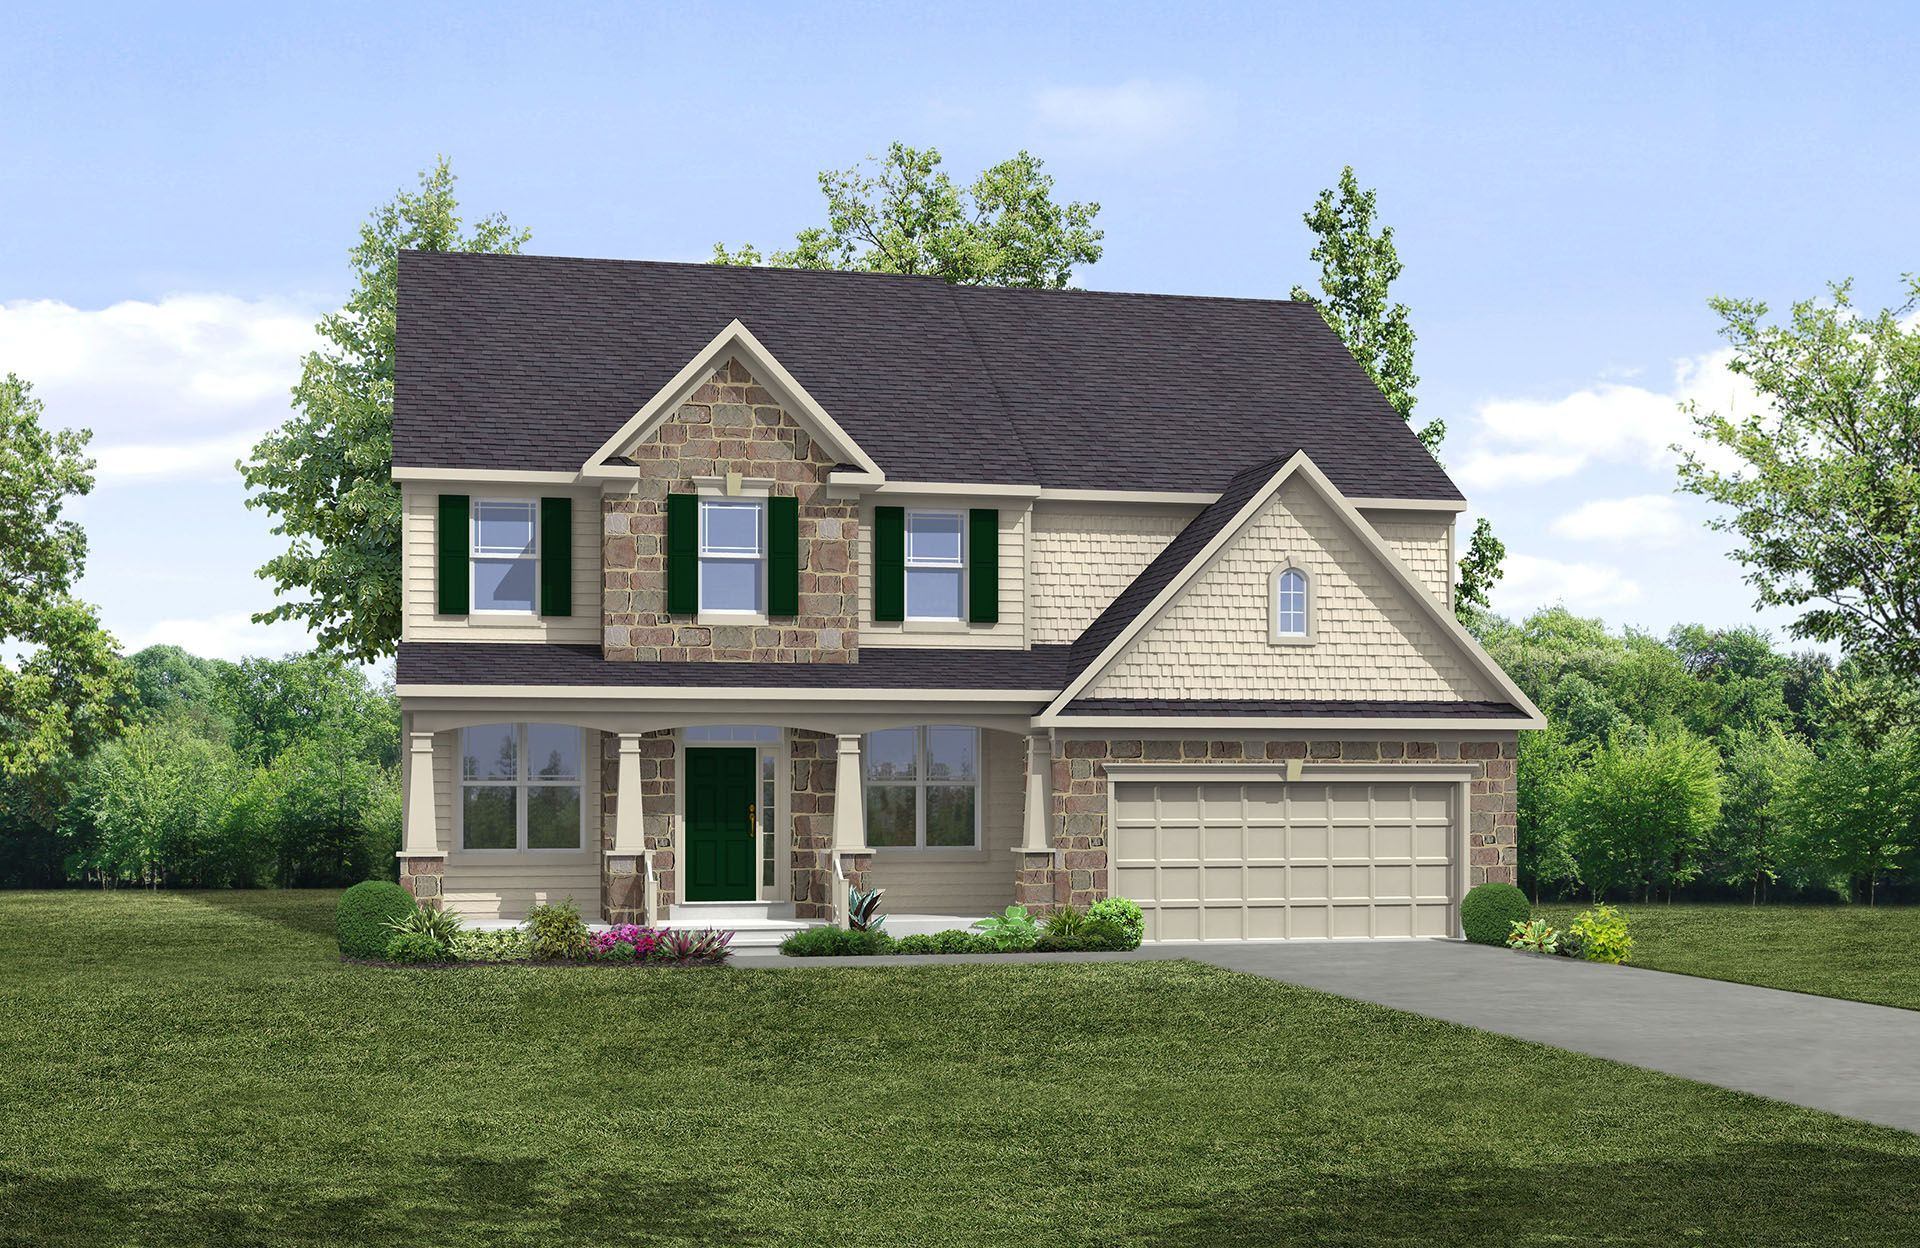 4852 TEEN BARNES ROAD, Frederick, MD Homes & Land - Real Estate